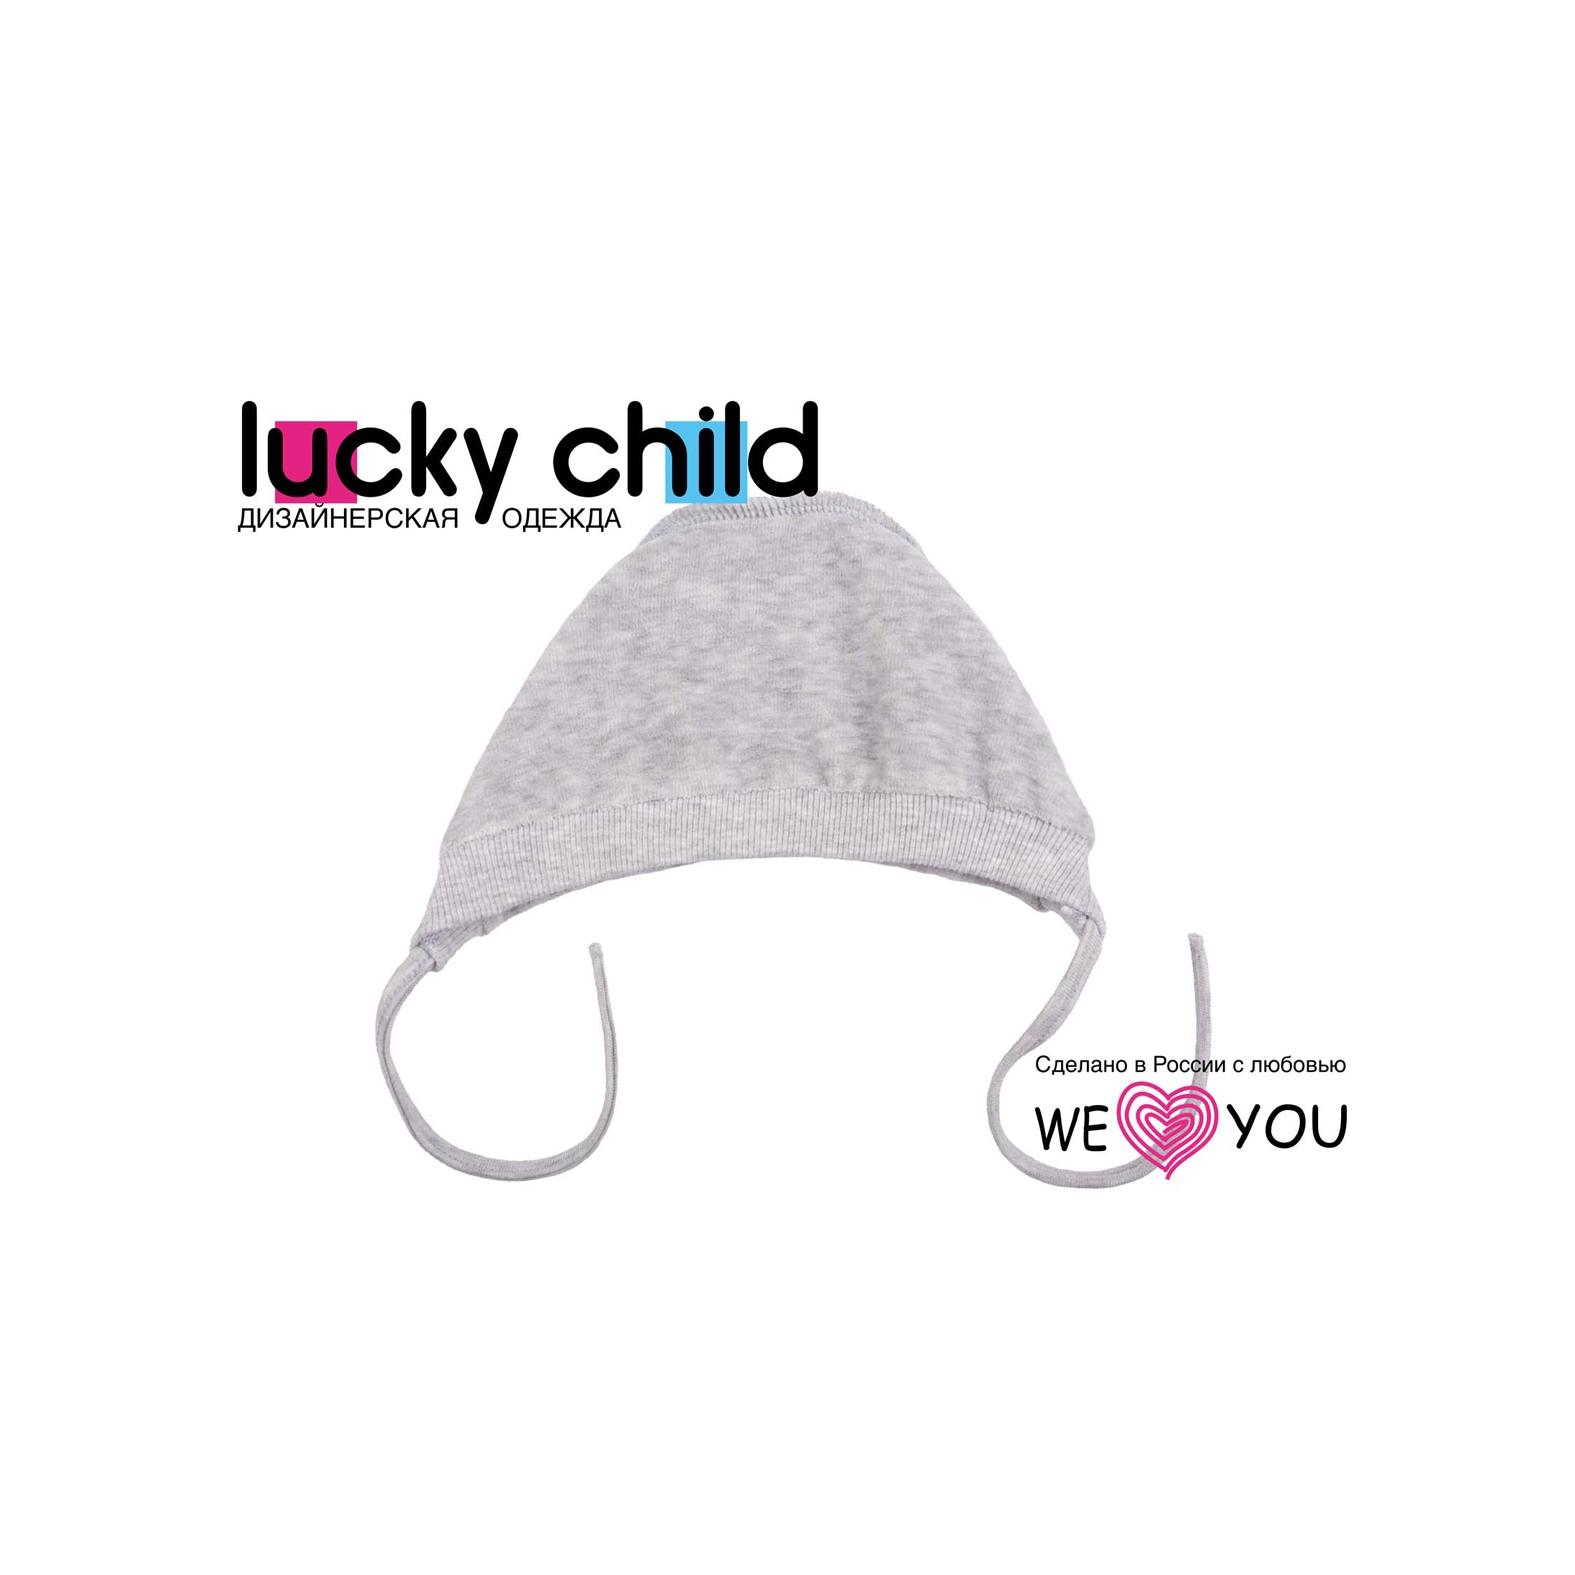 Чепчик из велюра Lucky Child, цвет серый размер 45<br>